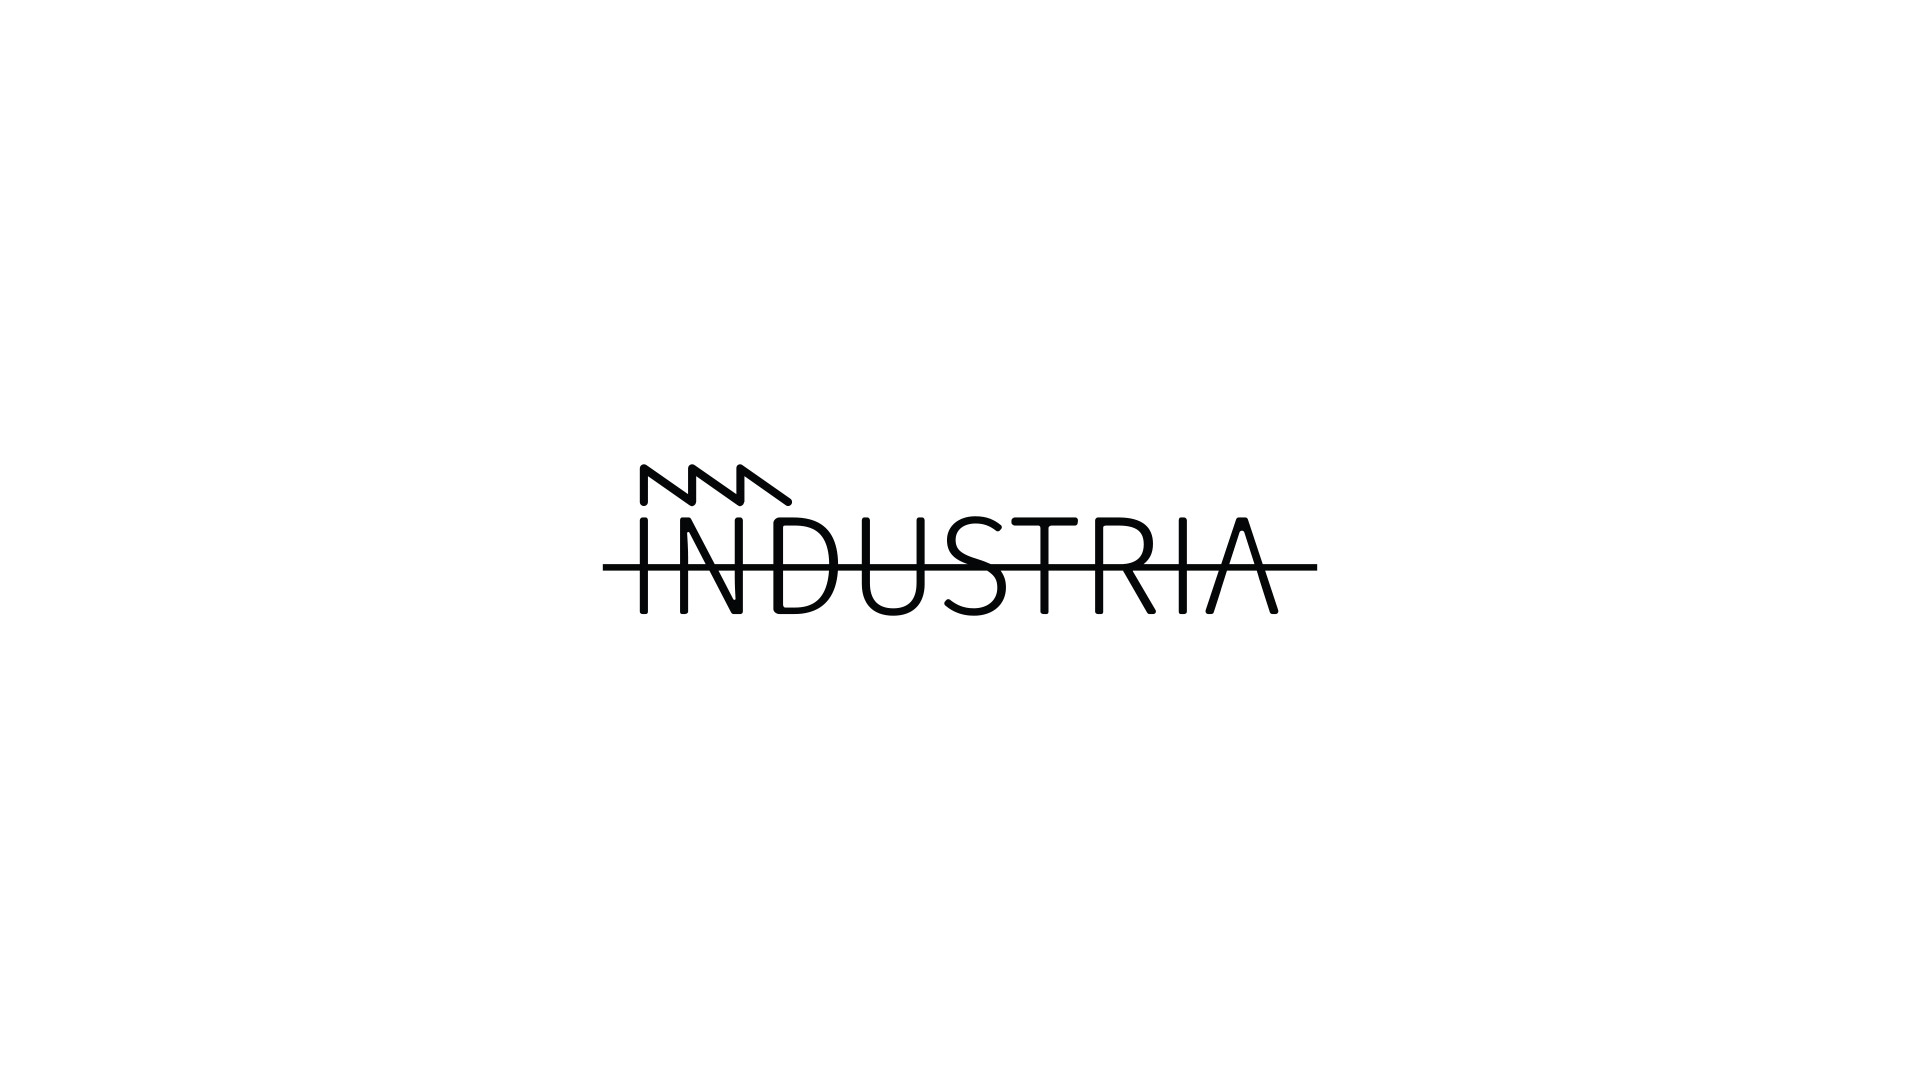 00 industria design logotype grafico milano